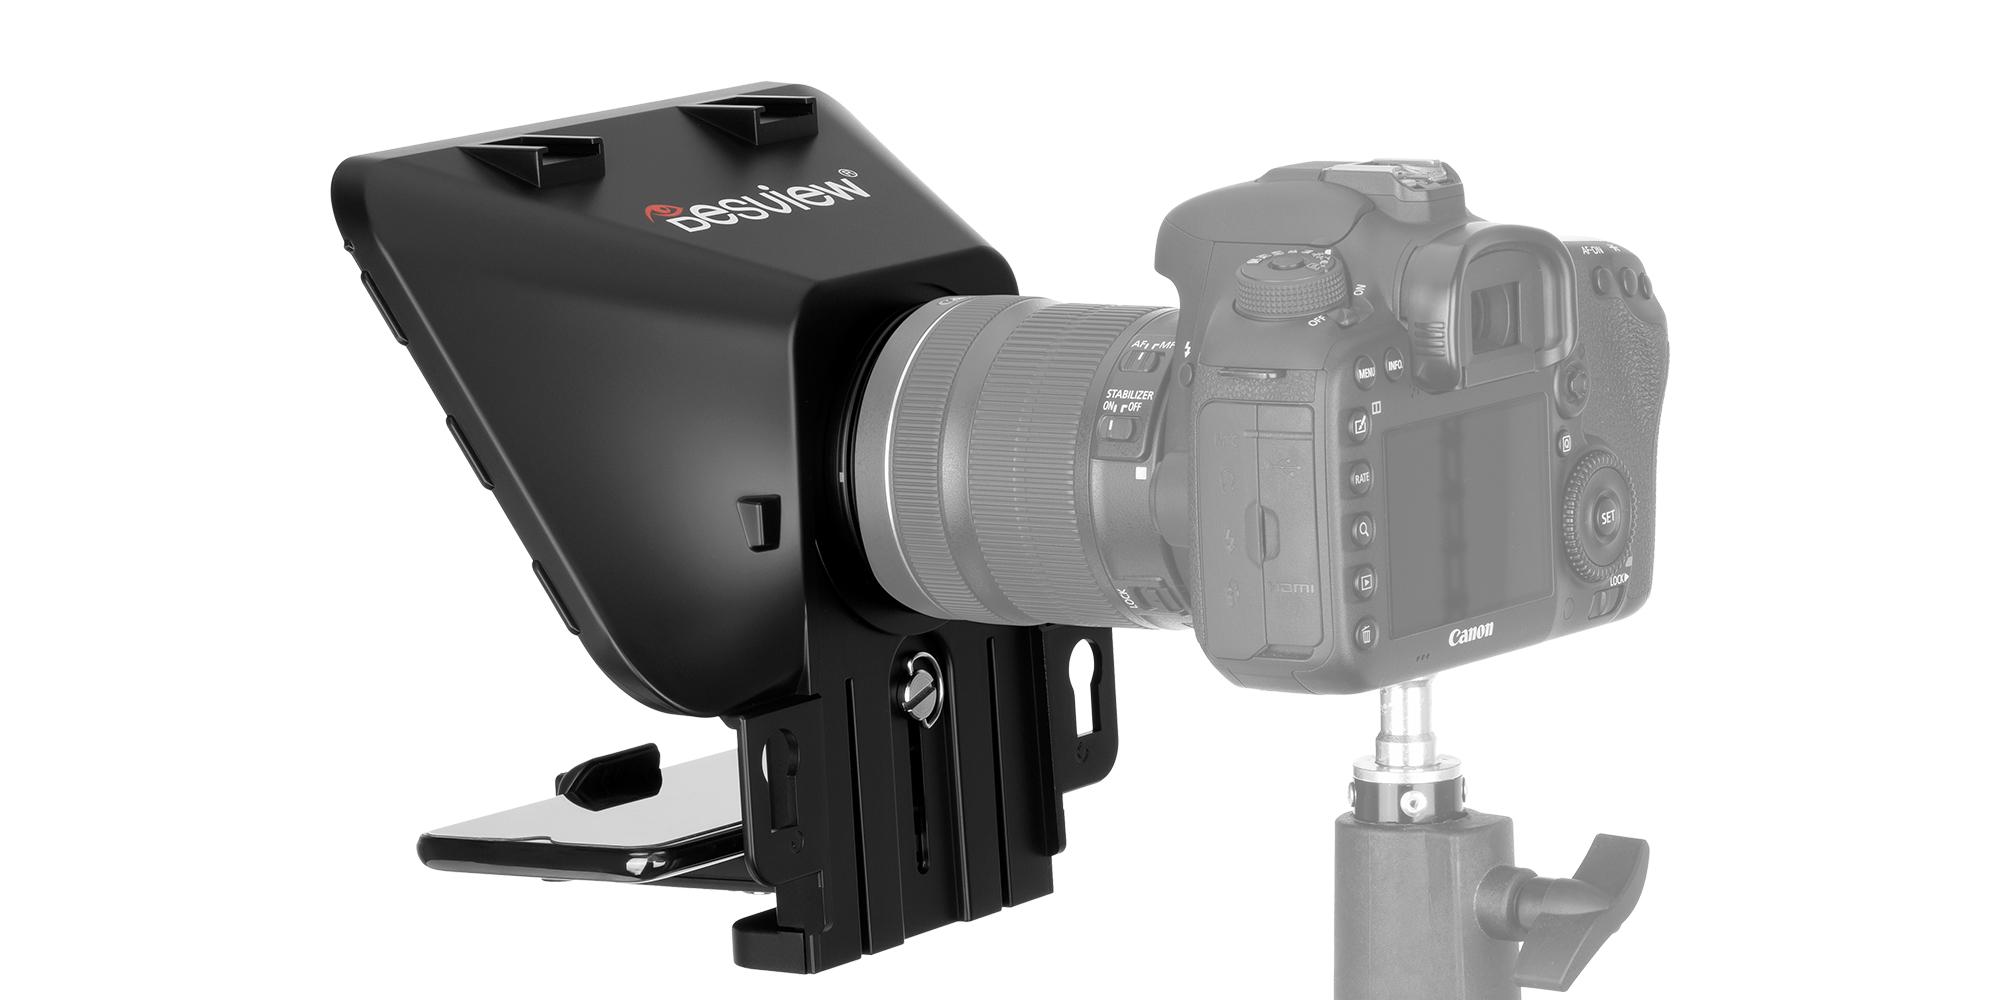 Teleprompter Desview T3 - Wysoka jakość obrazu